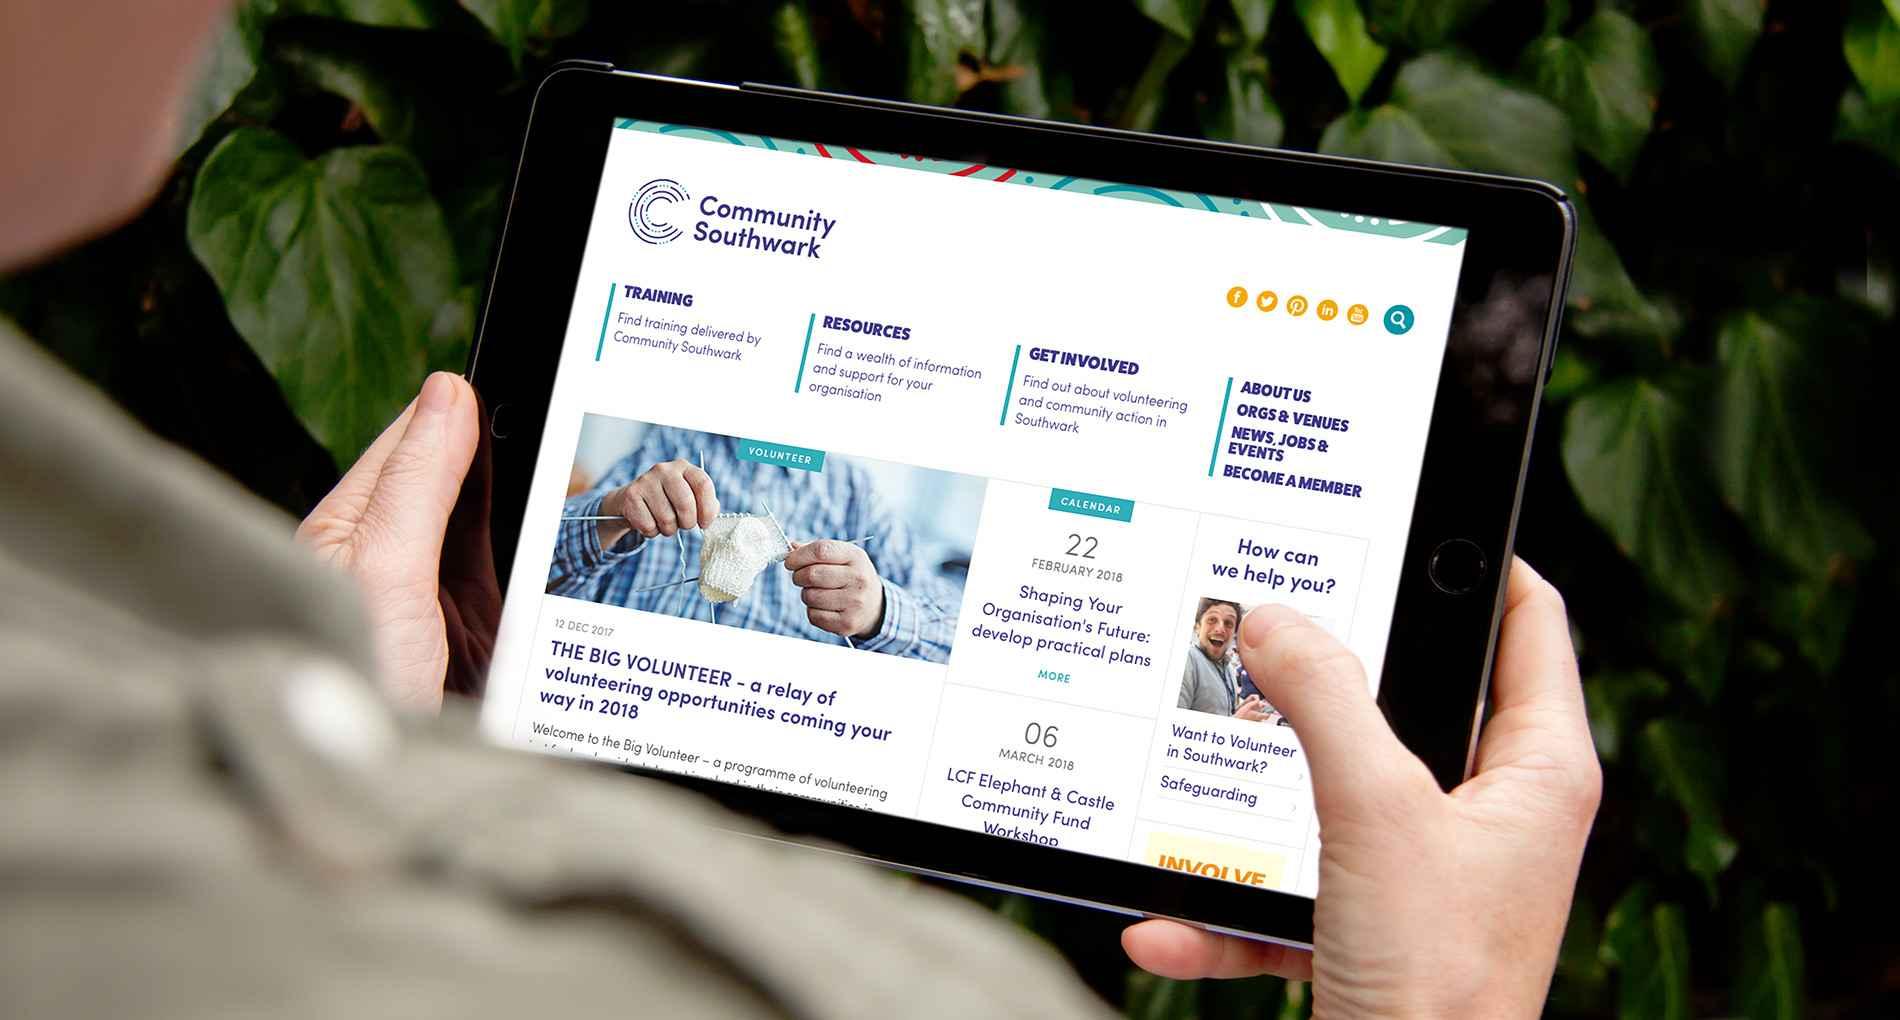 community southwark website on iPad